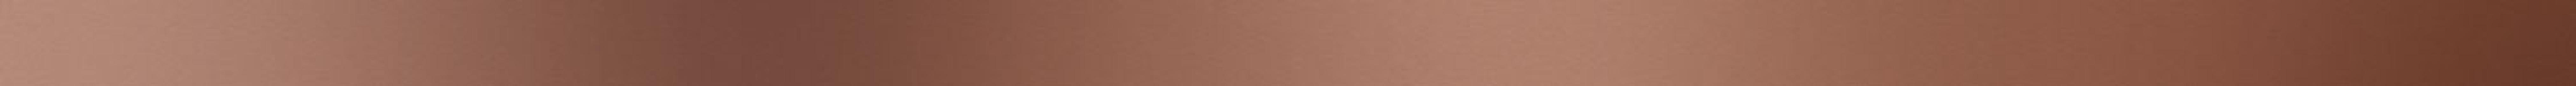 Tubądzin Steel copper 5 POL